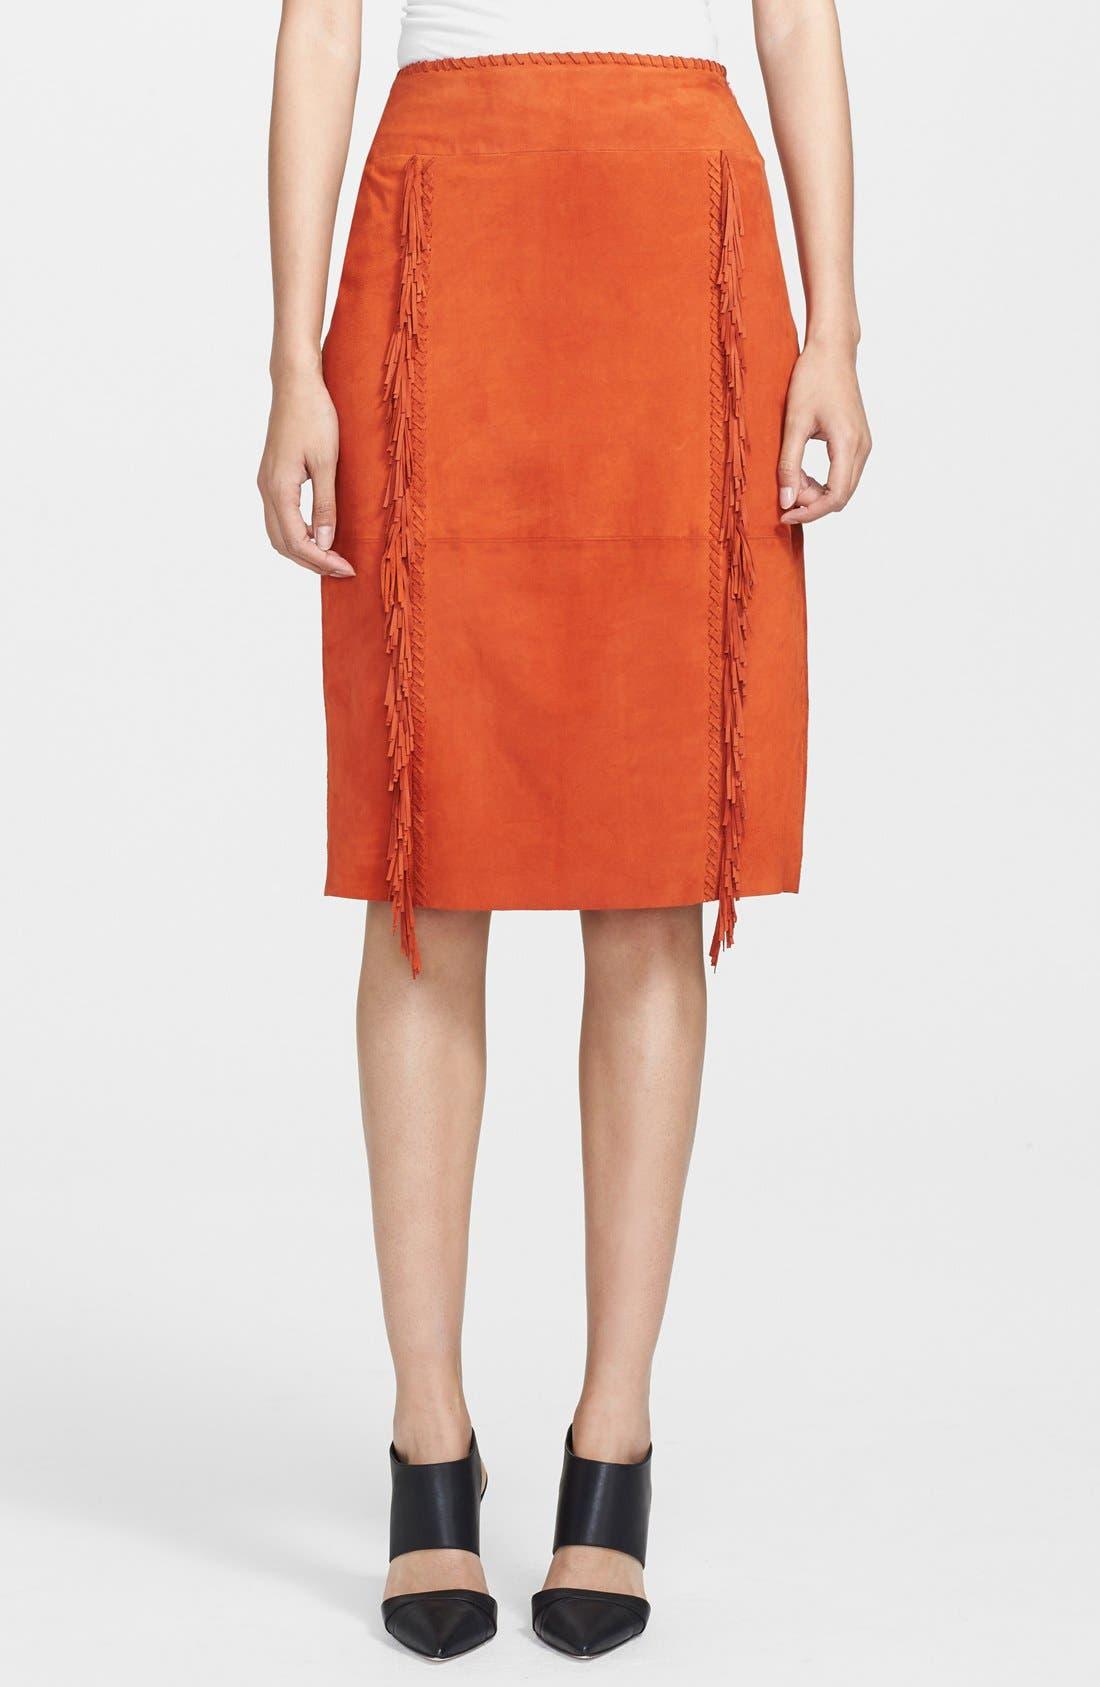 Alternate Image 1 Selected - Tamara Mellon Fringe Detail Suede Pencil Skirt